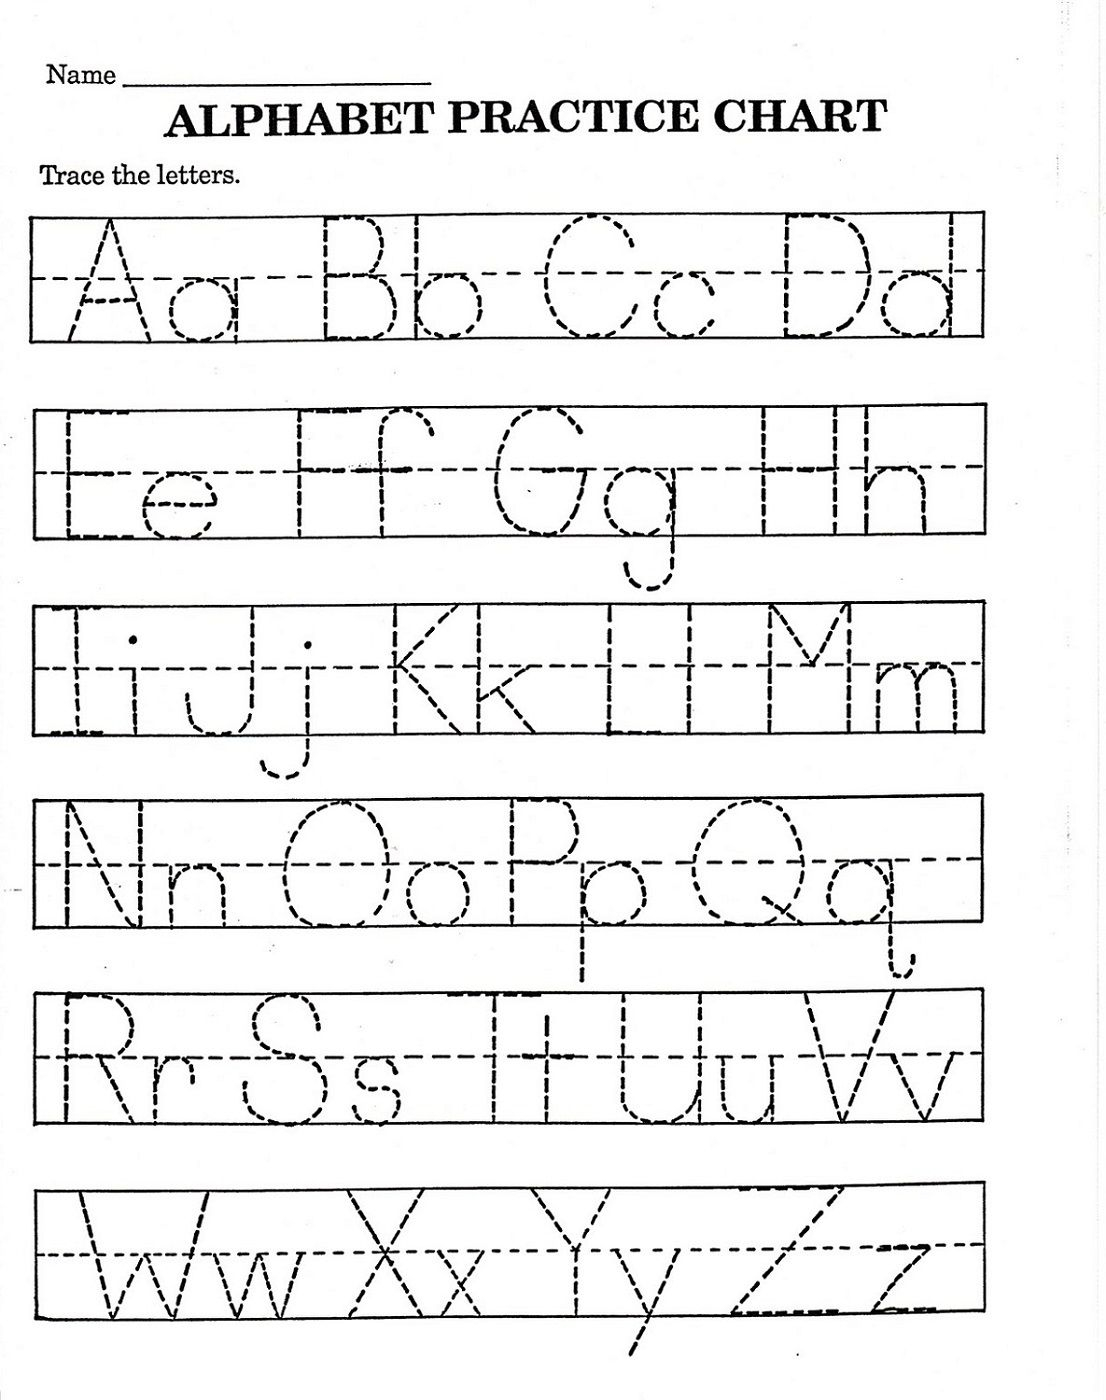 Trace Letter Worksheets Free | Reading And Phonics | Alphabet - Free Printable Alphabet Worksheets For Kindergarten